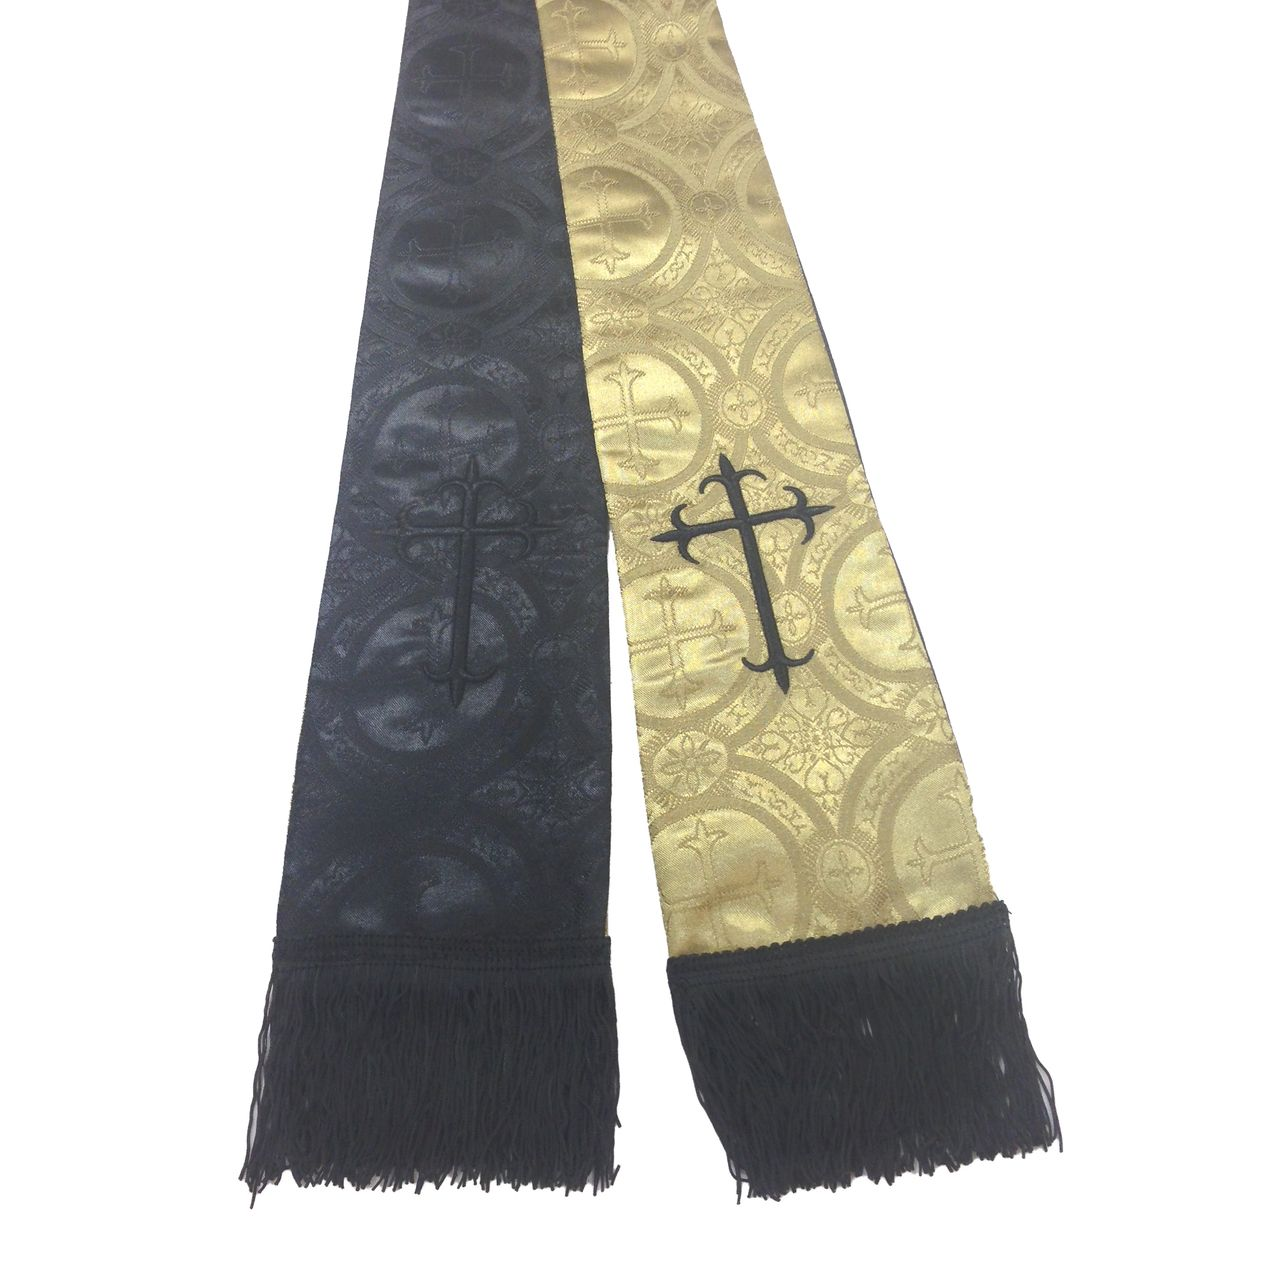 Premium Brocade Reversible Clergy Stole - Gold/Black